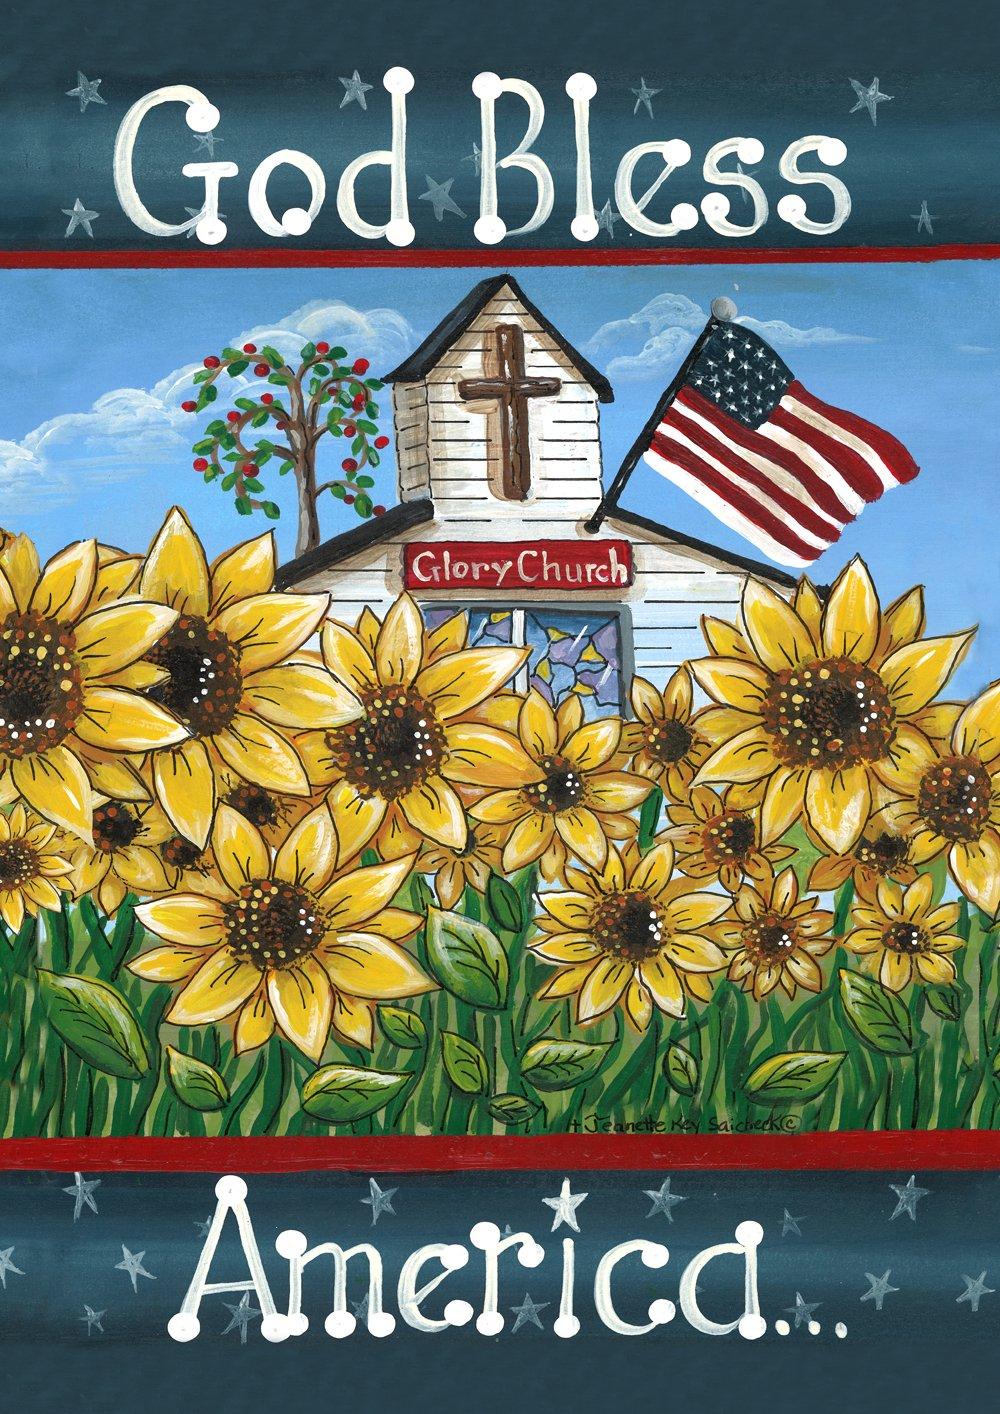 "Toland Home Garden 112133 Glory Church 12.5 x 18 Inch Decorative, Double Sided Garden Flag-12.5"" x 18"","